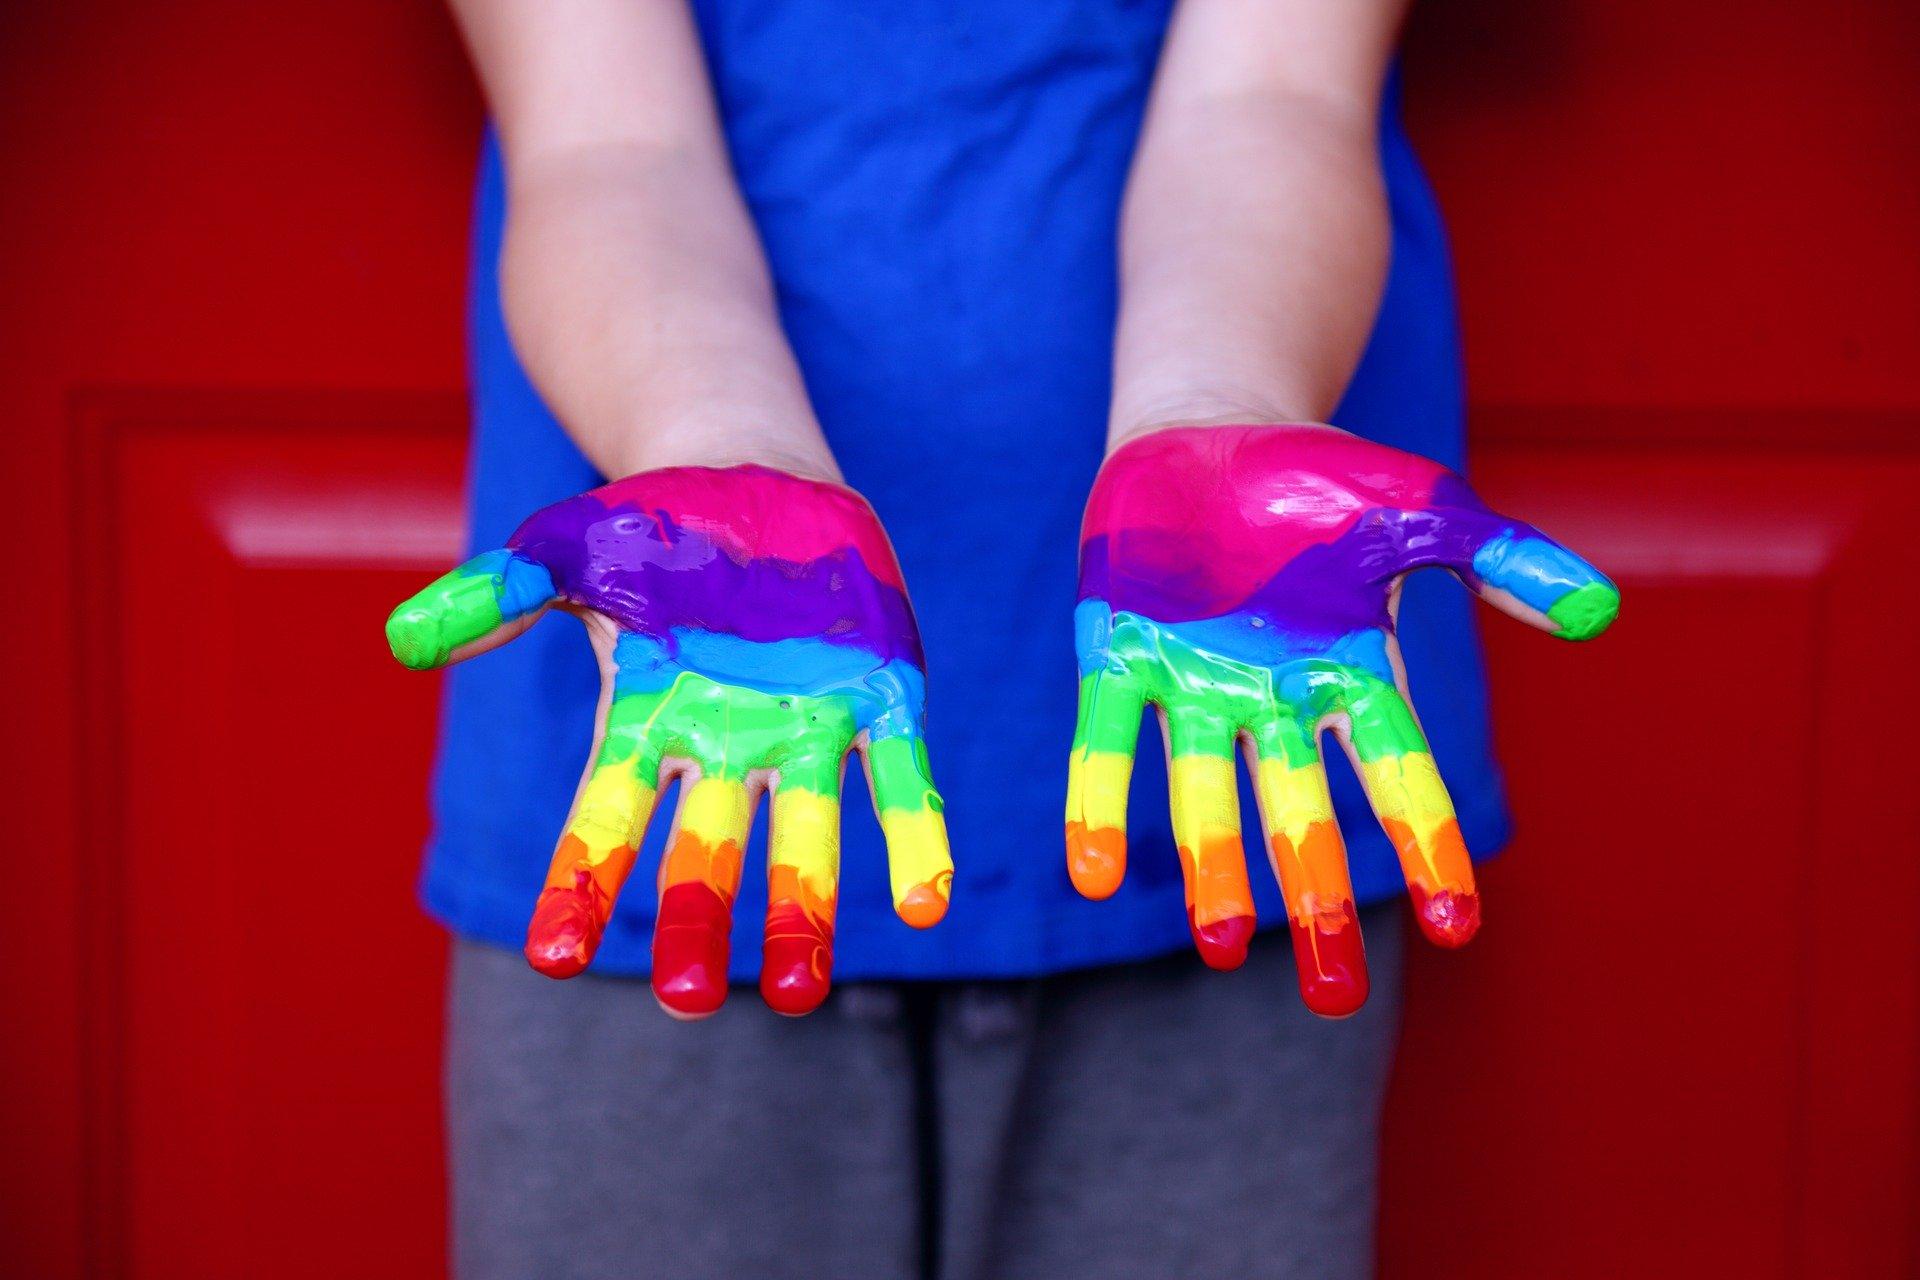 derechos-humanos-lgbtiq-orgullo-manos-pintadas